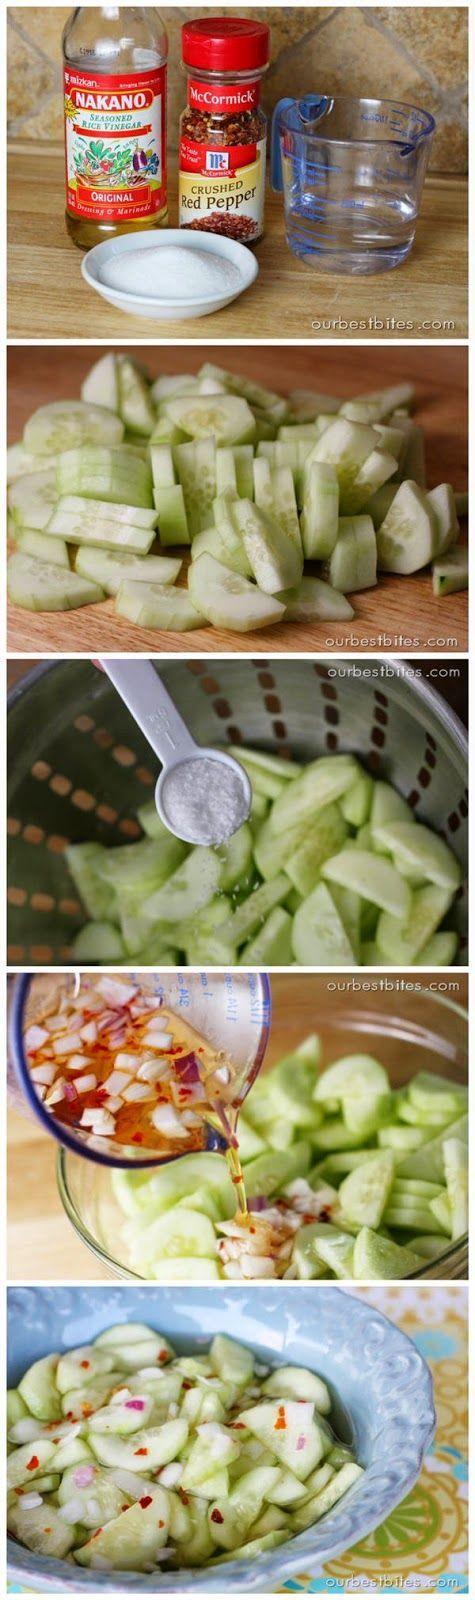 Sweet & Spicy Cucumbers Ingredients: 1-1/2 lbs cucumber (about 3 medium), peeled, halved lengthwise & thinly sliced 2 tsp kosher salt 1/2 c rice vinegar, seasoned or regular 1/2 c water 3 T…